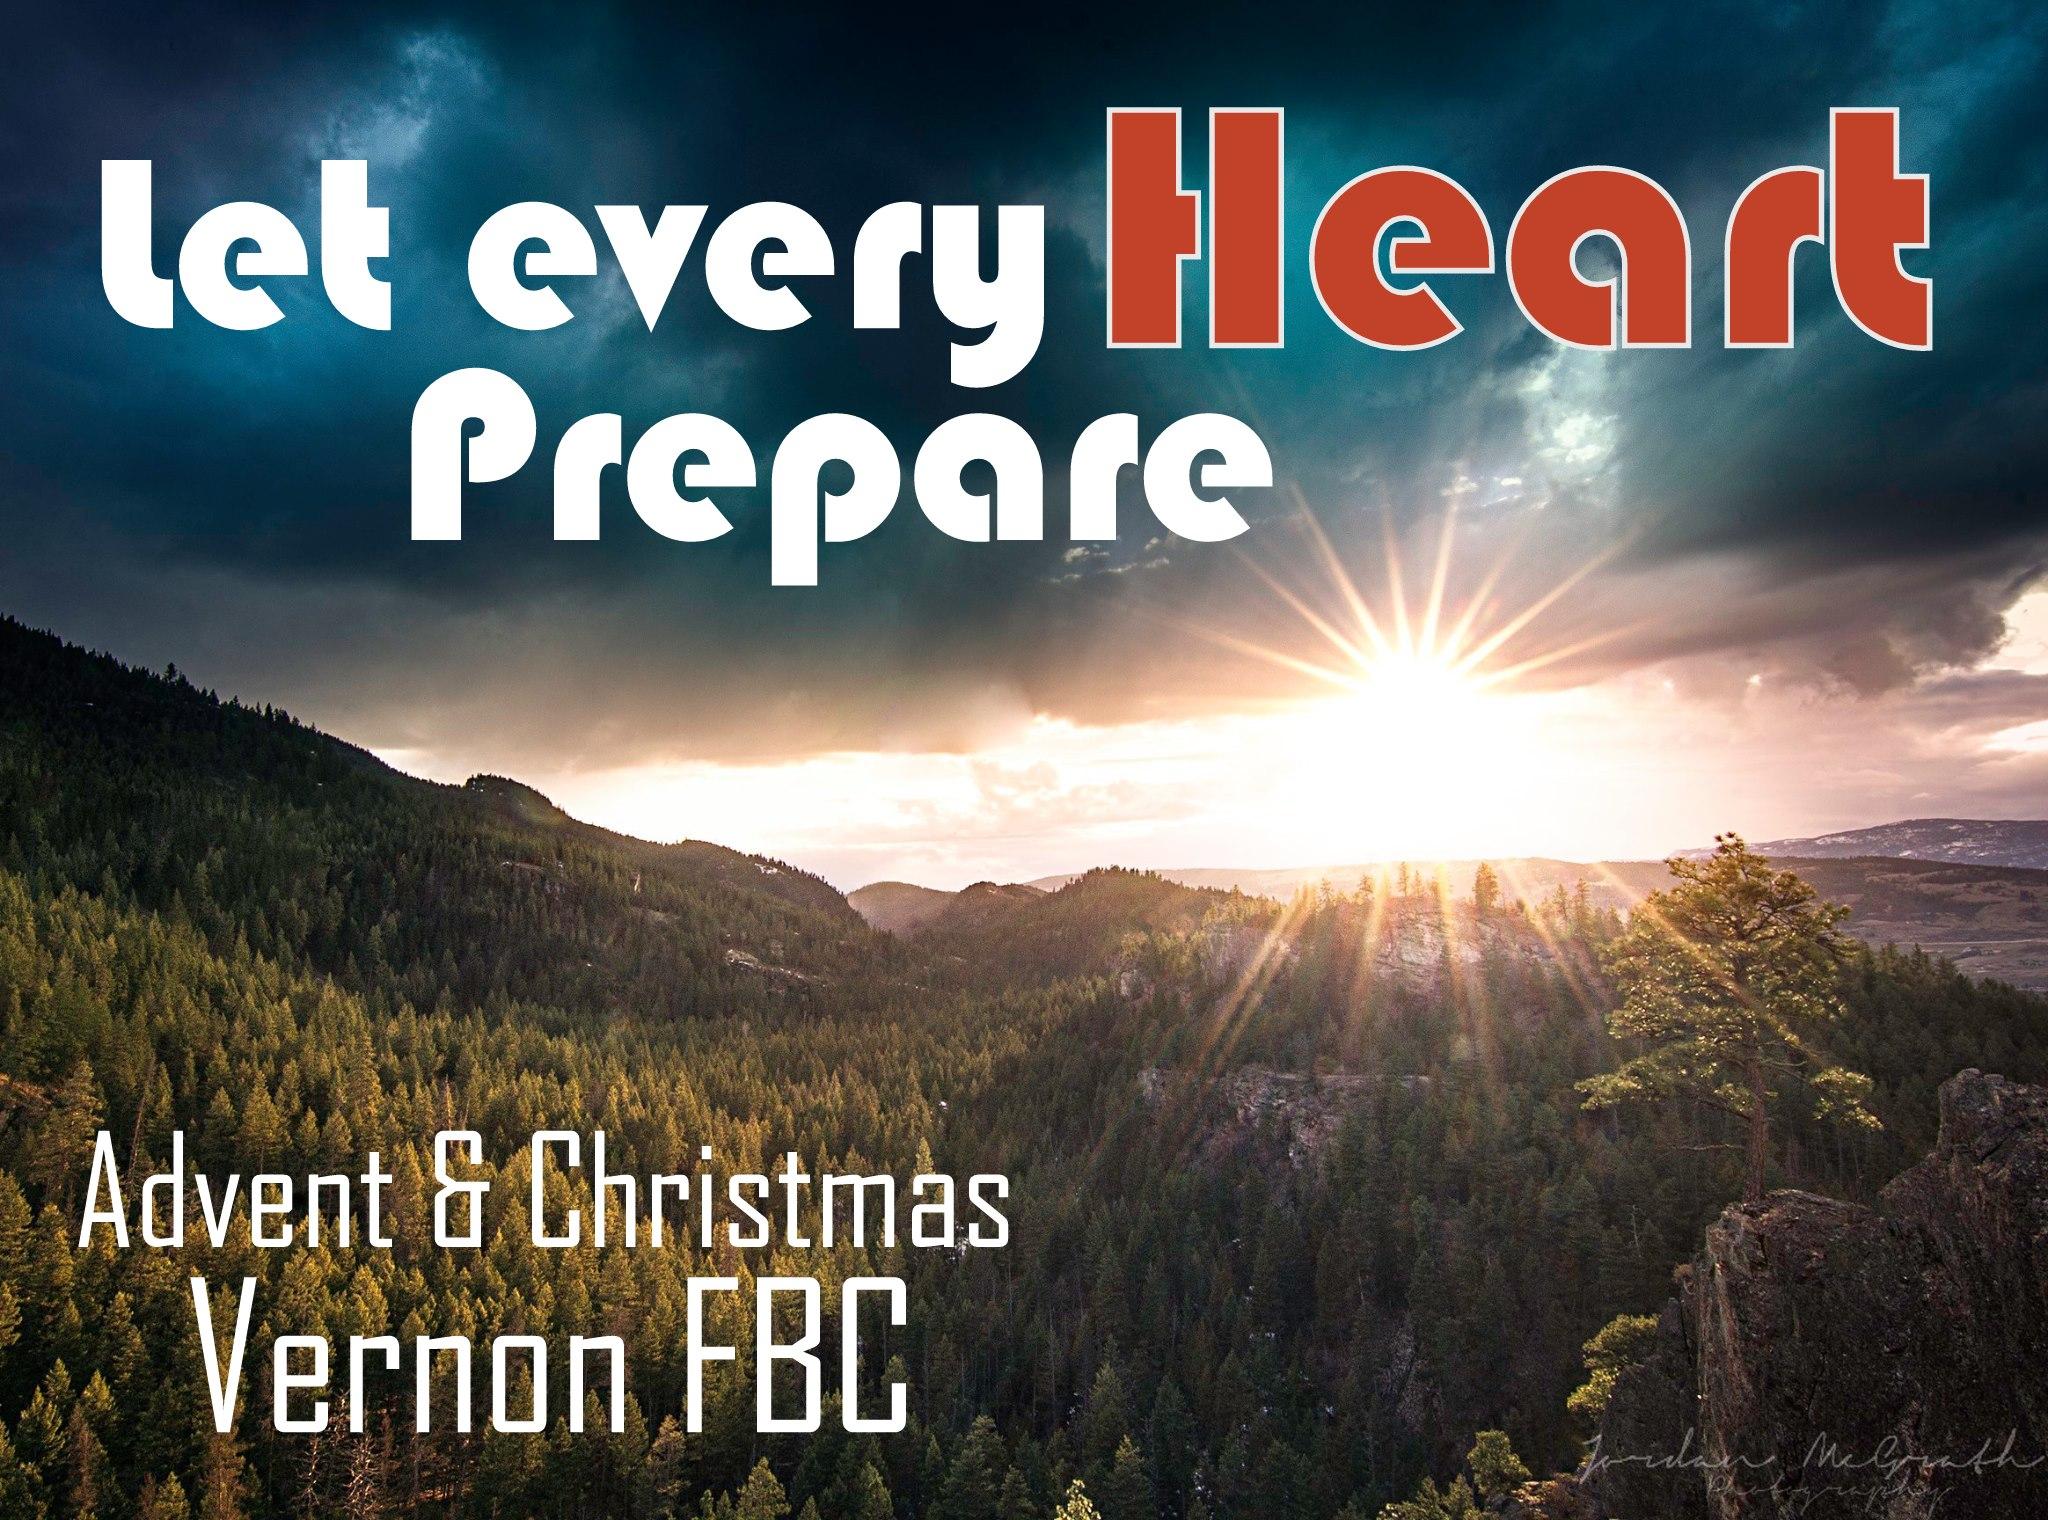 Prepare for… Joy - December 16, 2018 Randy HammLuke 2:9-21The Shepherds heard news of Great Joy. What is this Joy all about?